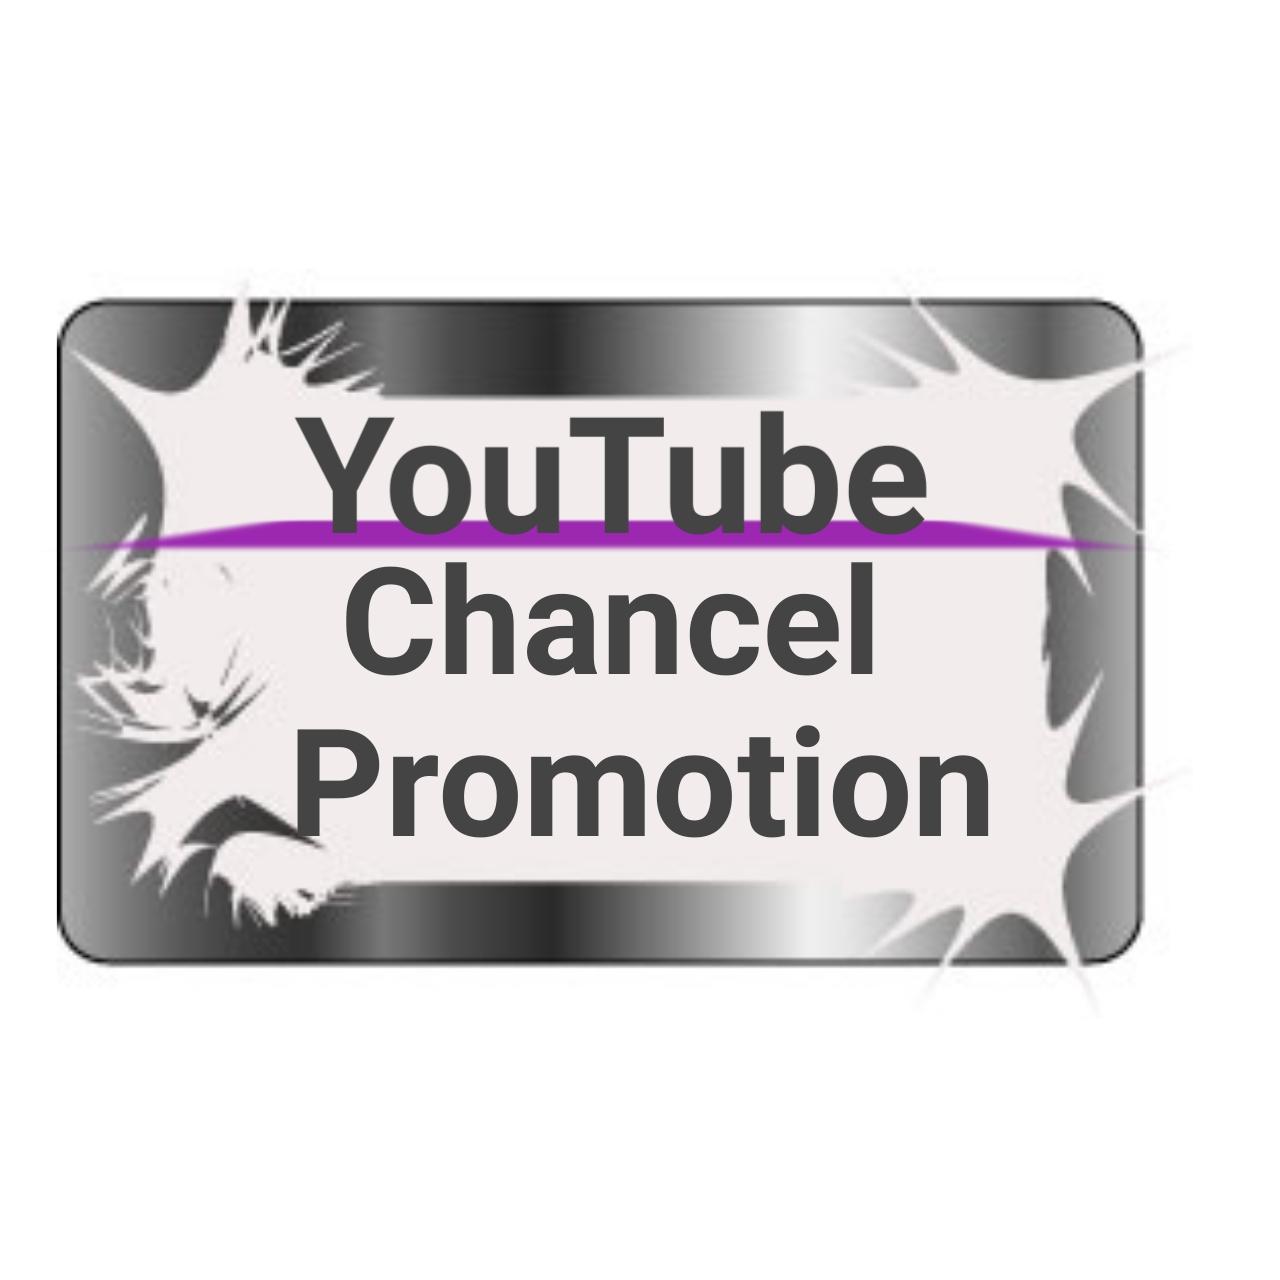 YouTube Chancel promotion and Marketing